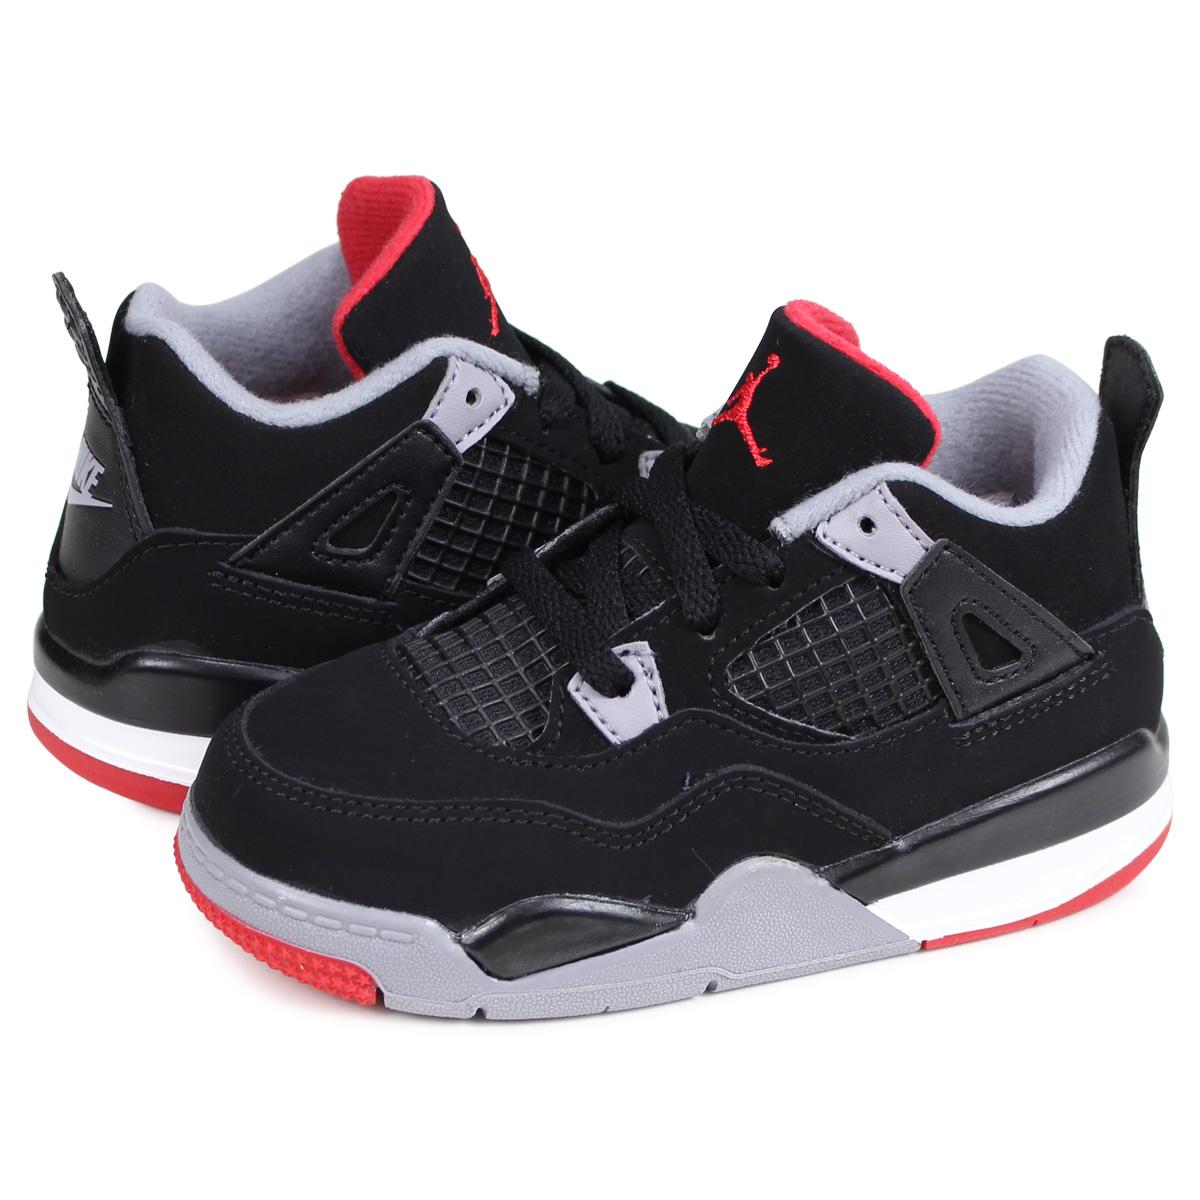 new arrival f7c04 7651e Nike NIKE Air Jordan 4 nostalgic sneakers kids baby AIR JORDAN 4 RETRO TD  BRED black black BQ7670-060 [195]